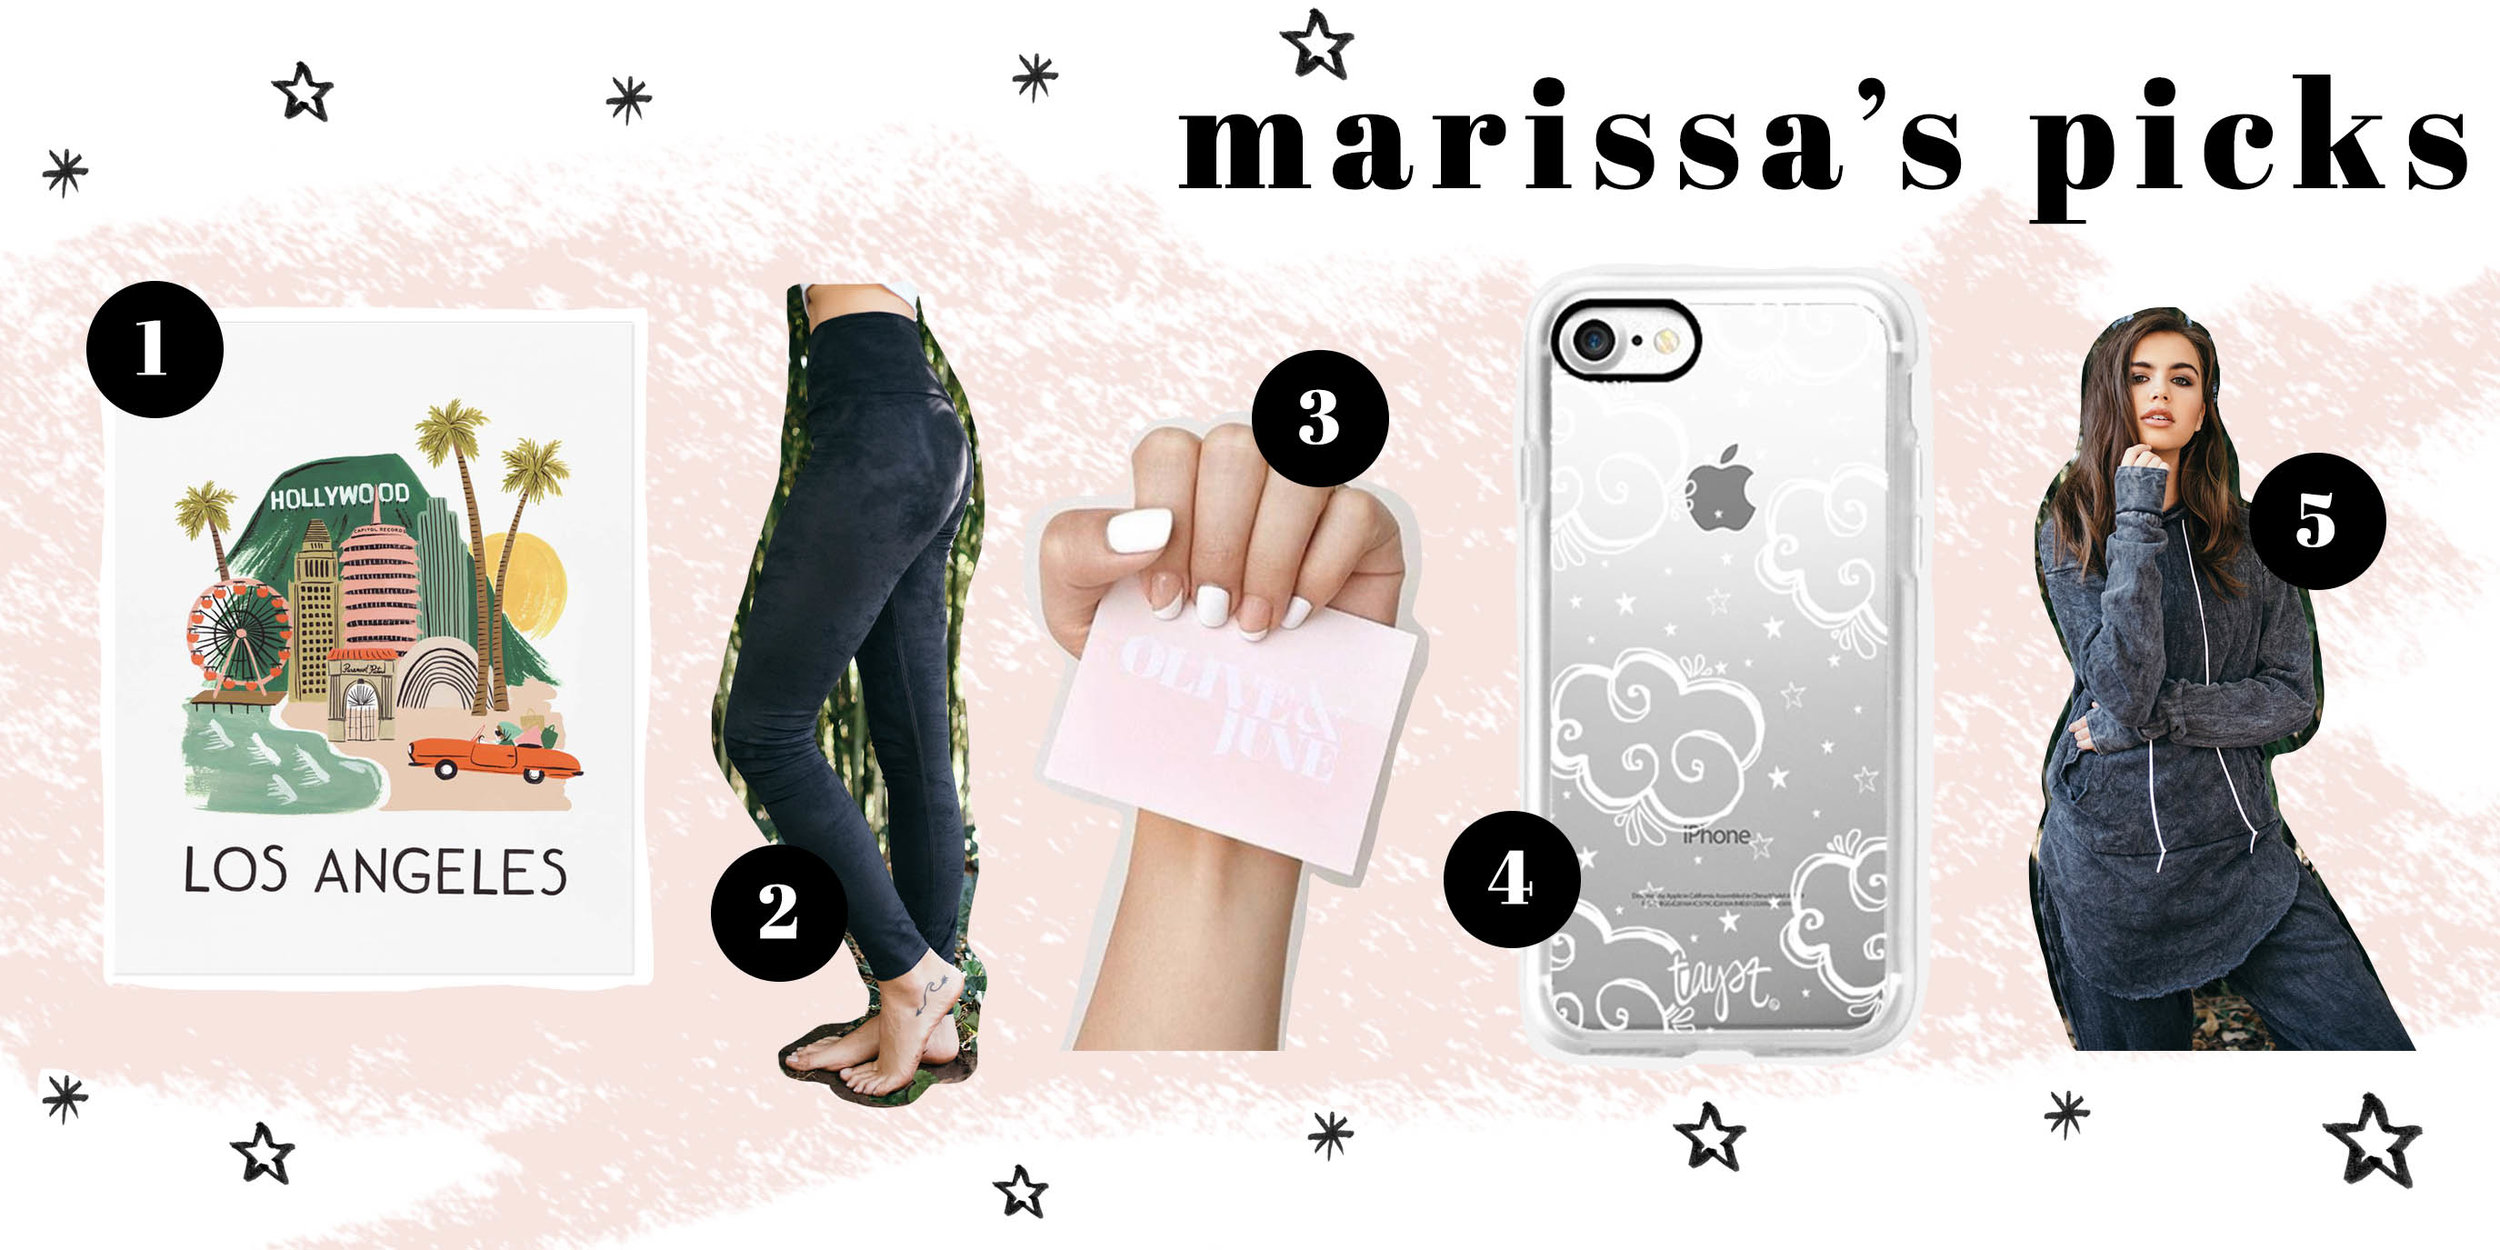 MarissaGGbyTayst